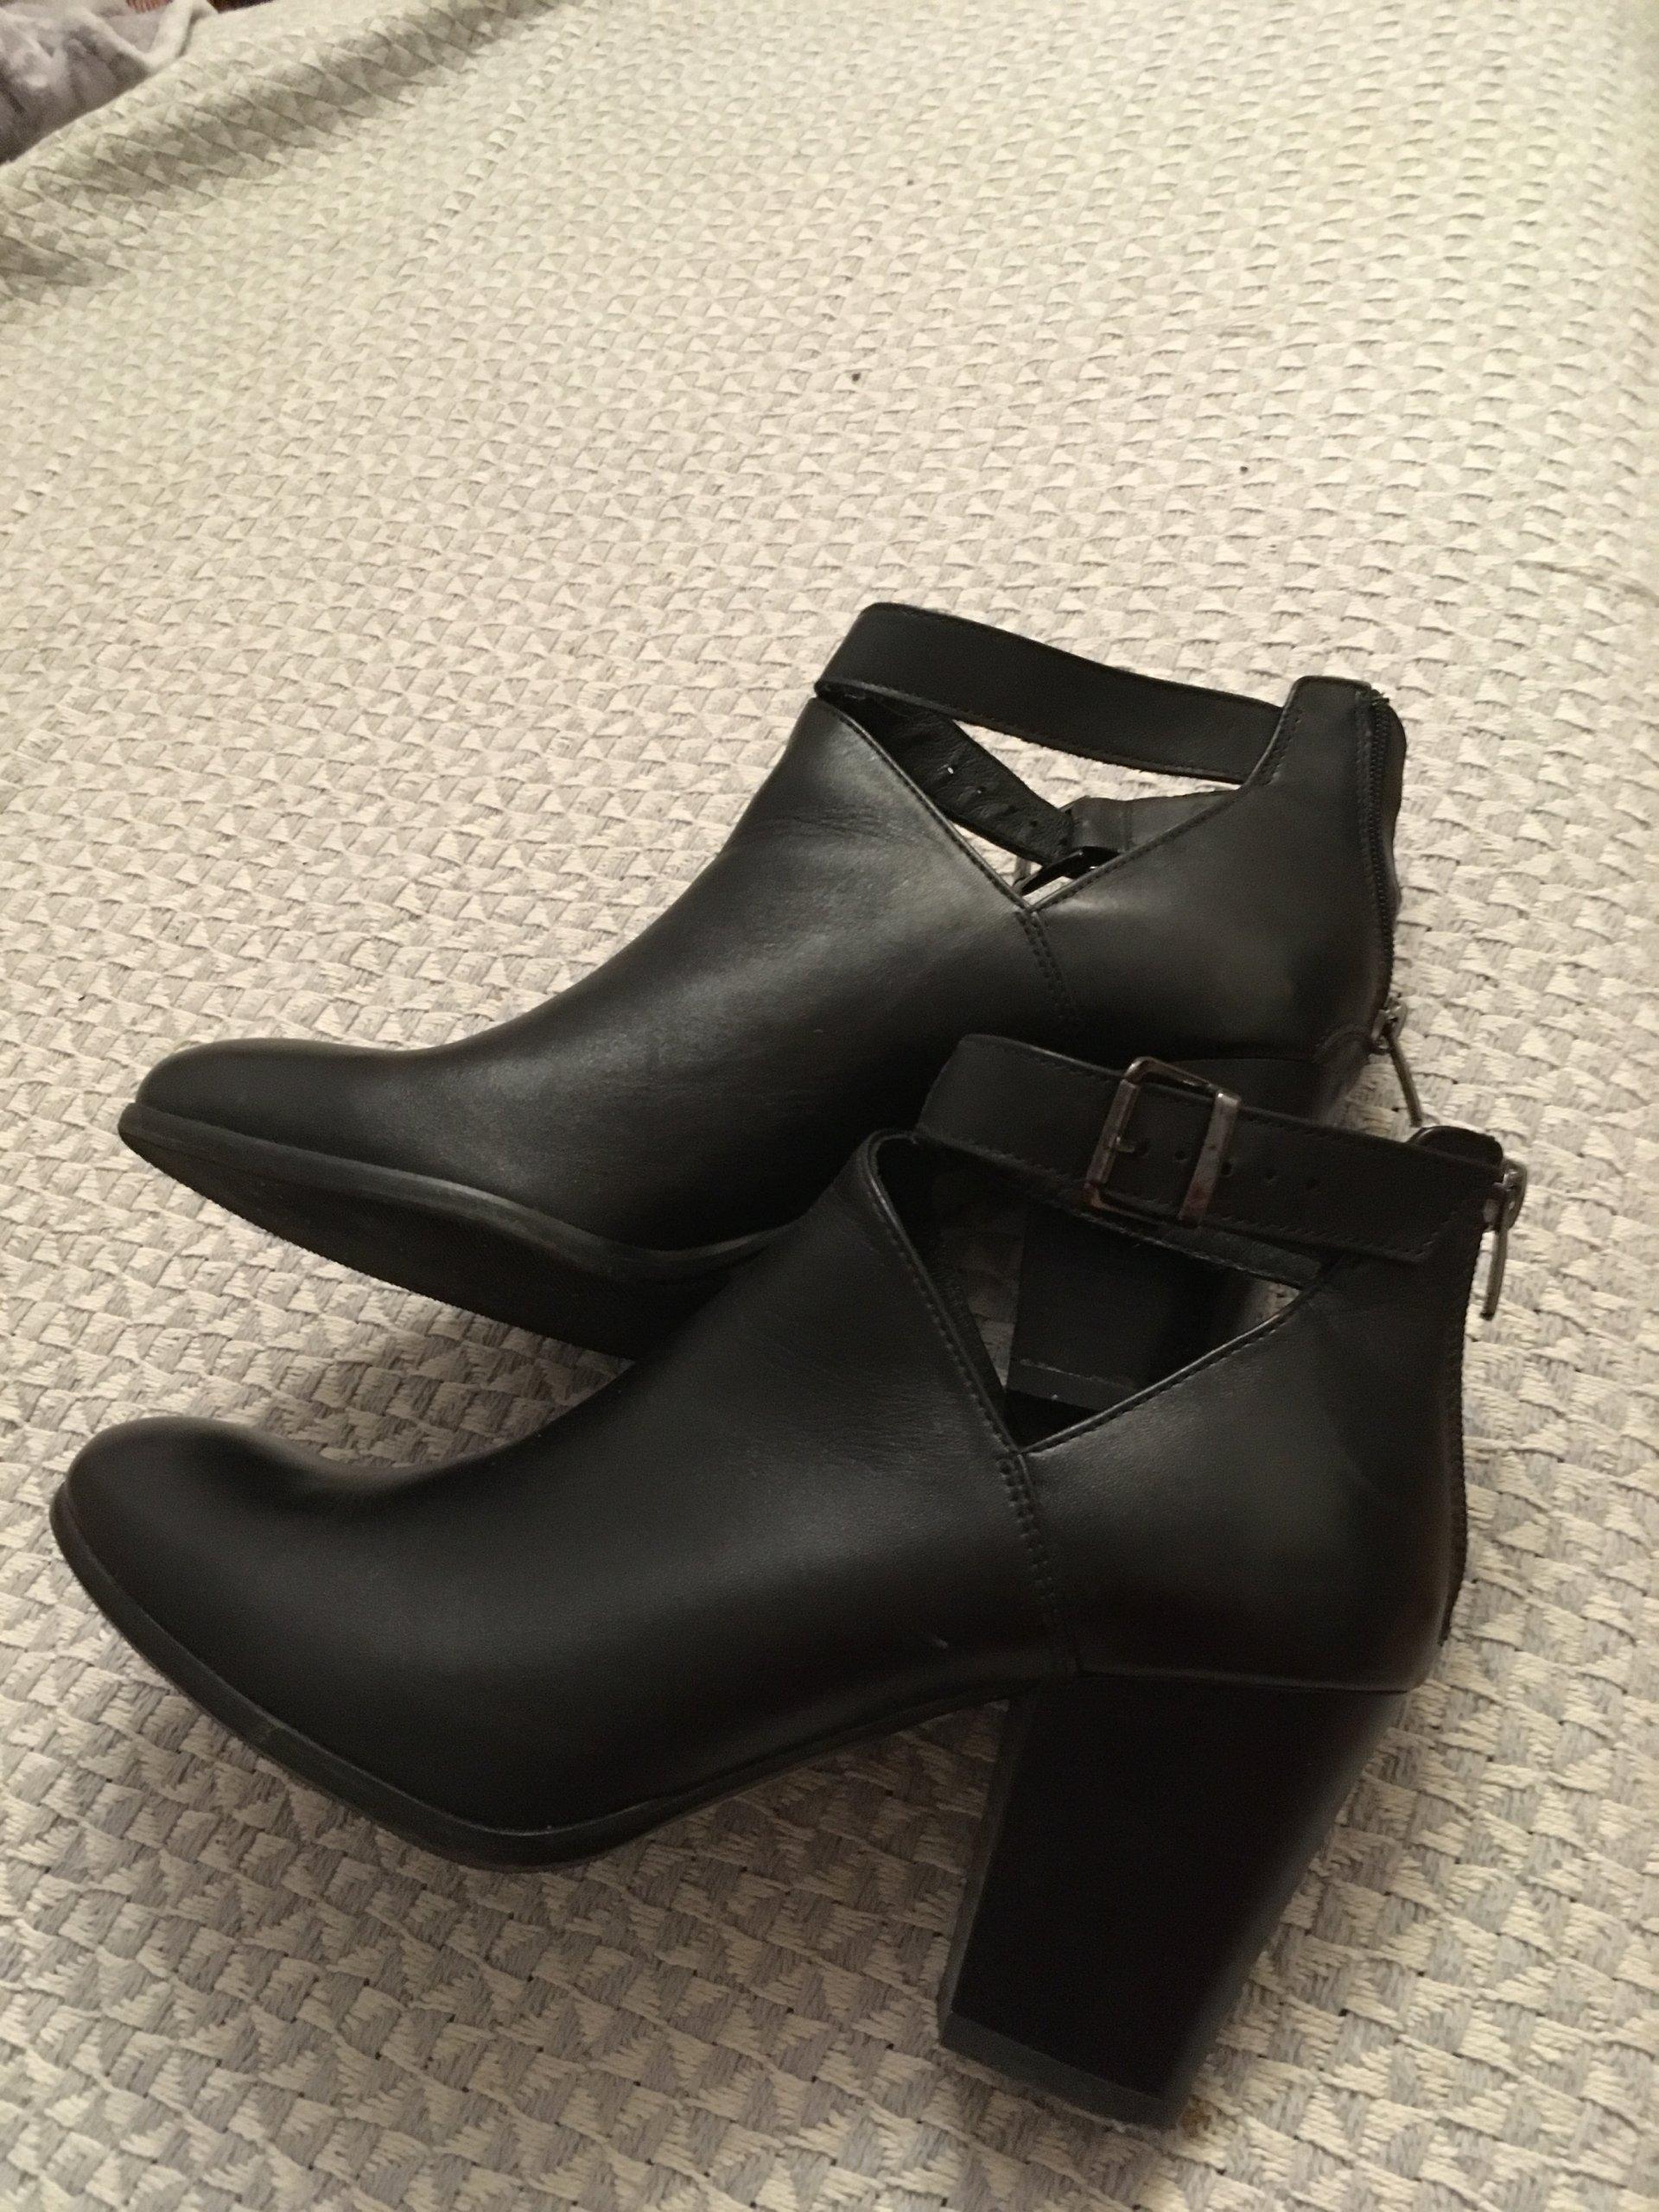 33ea4aa22dd67 Lasocki buty botki CCC czarne 40 prawie nowe skóra - 7233664326 ...